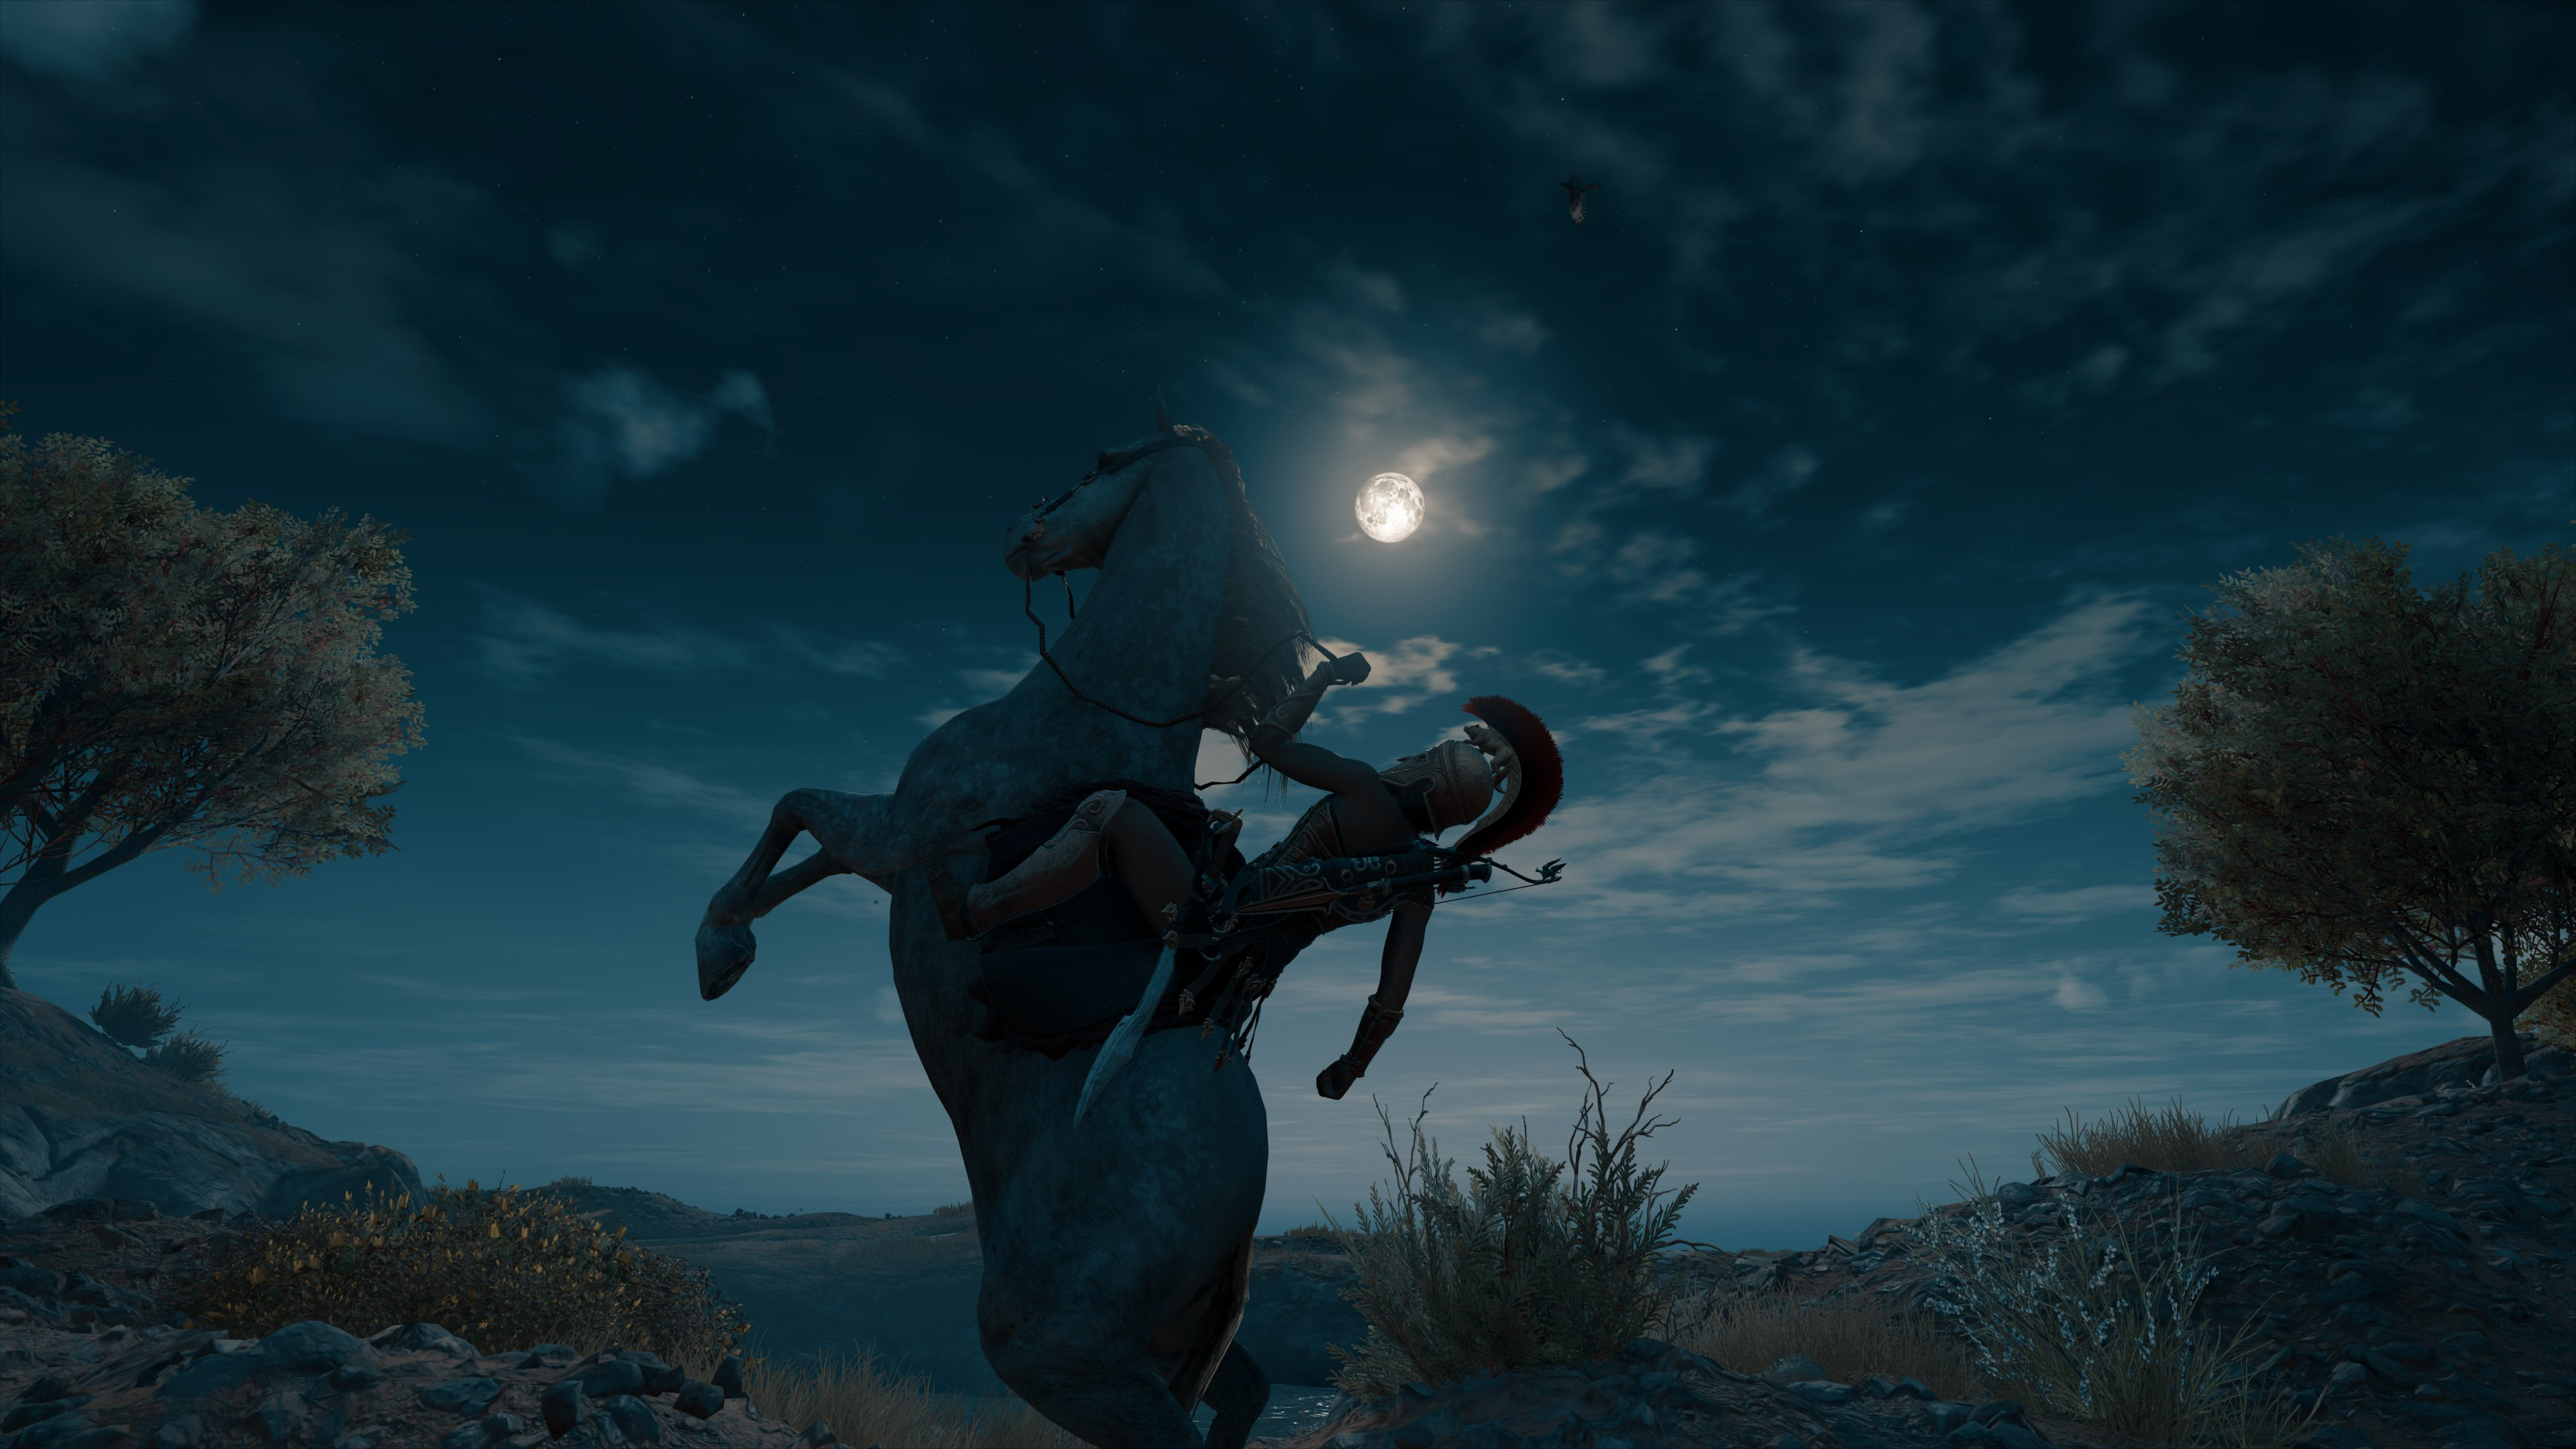 20181031162835.jpg - Assassin's Creed: Odyssey